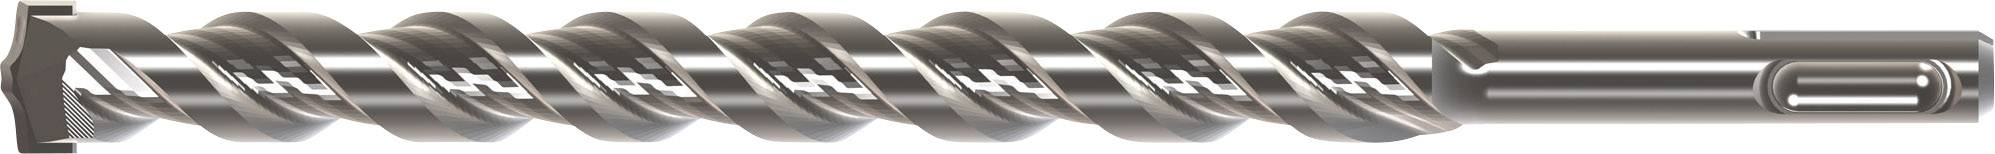 Tvrdý kov kladivový vrták Heller 159722, 16 mm, 600 mm, 1 ks